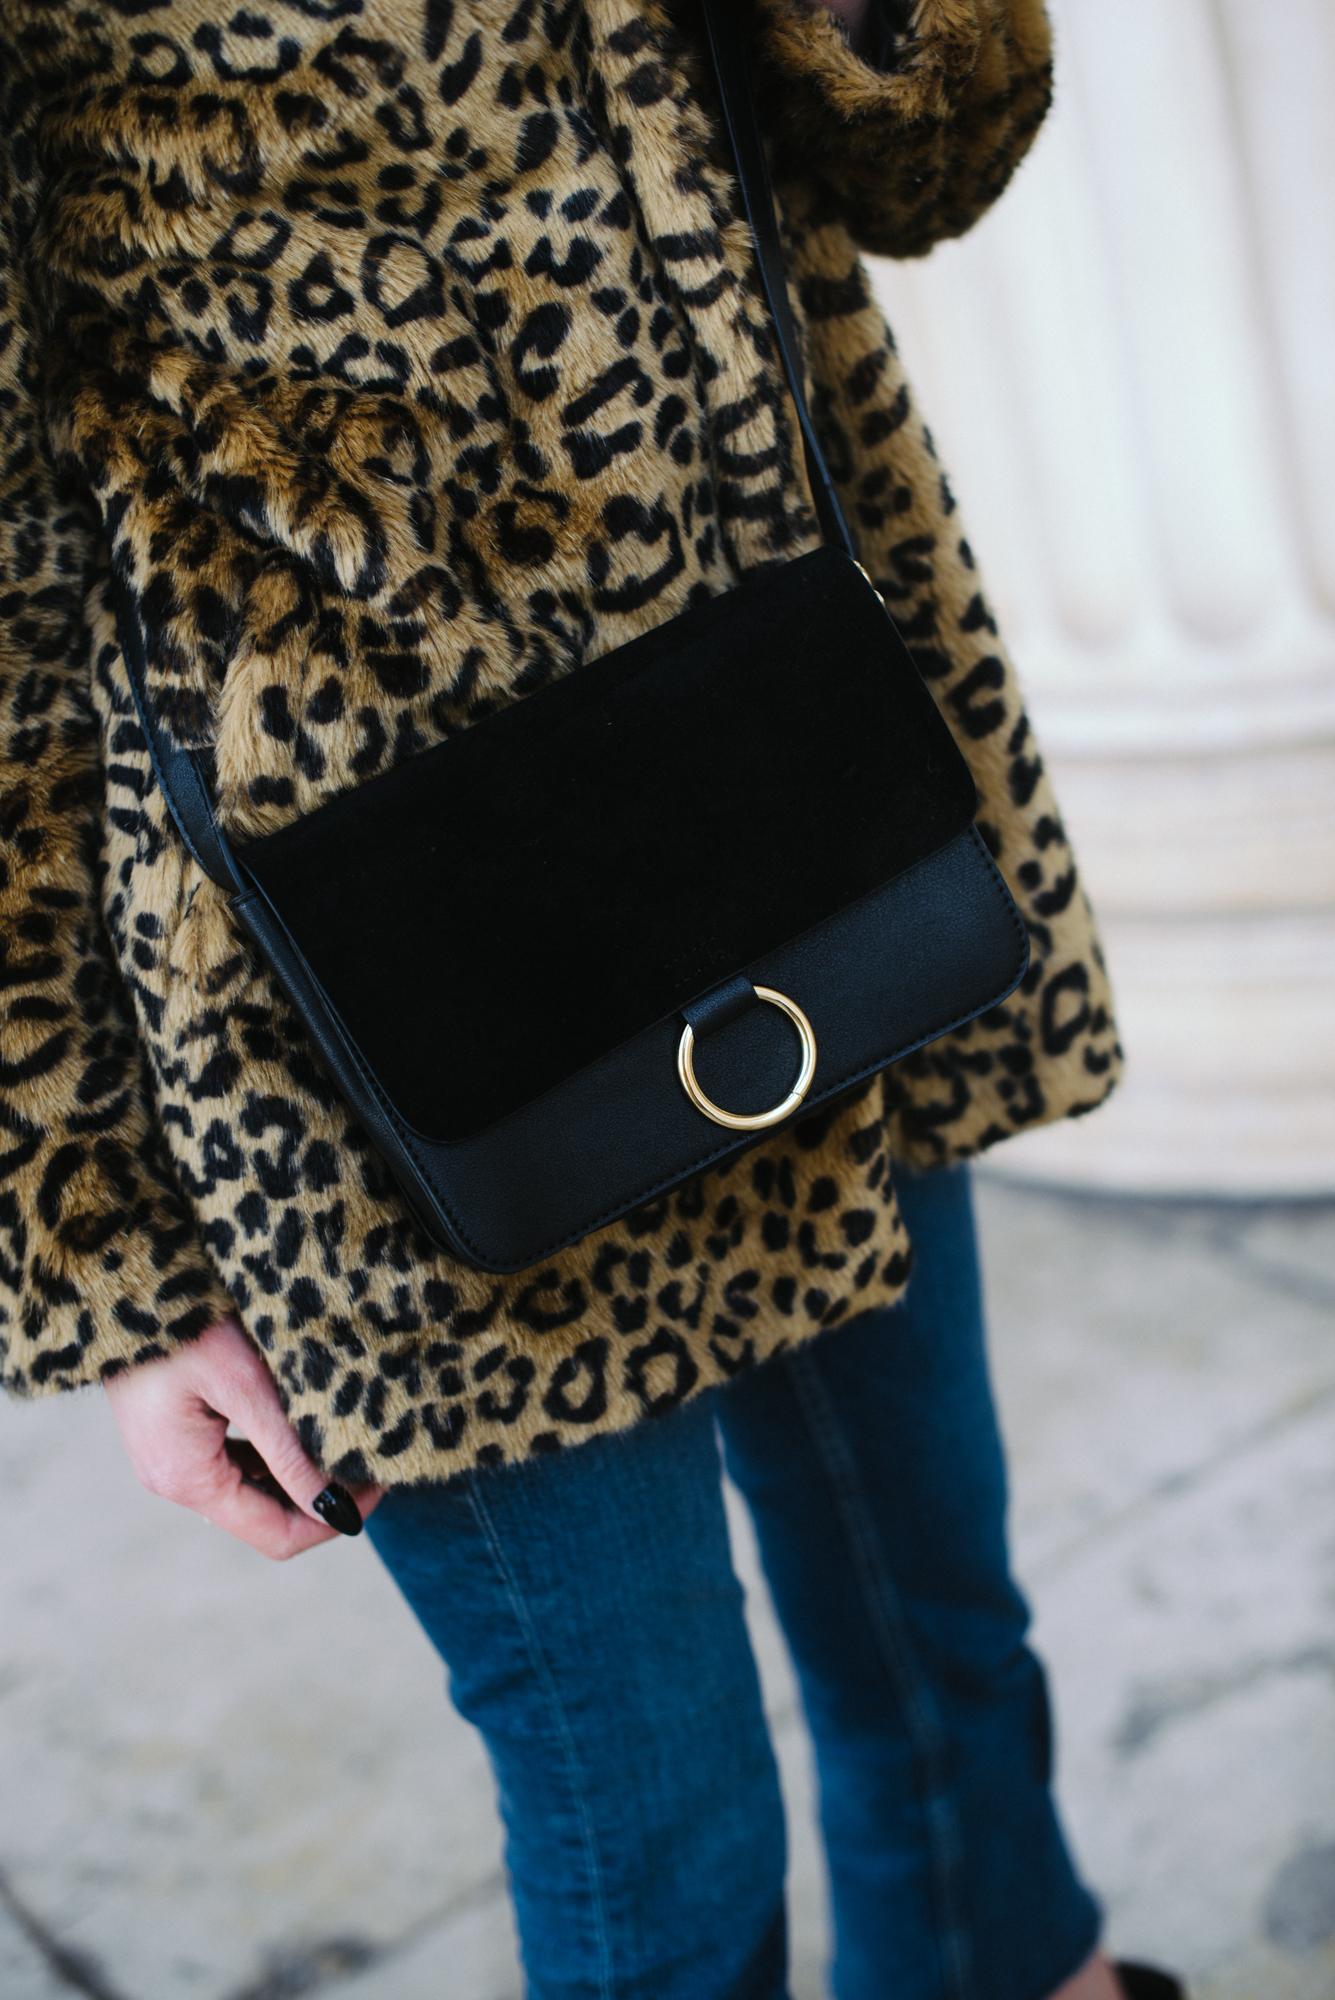 Kiamisu_Modeblog_Fashionblog_Beautyblog_Leo Mantel_Zara_Leo Mantel kombinieren-16